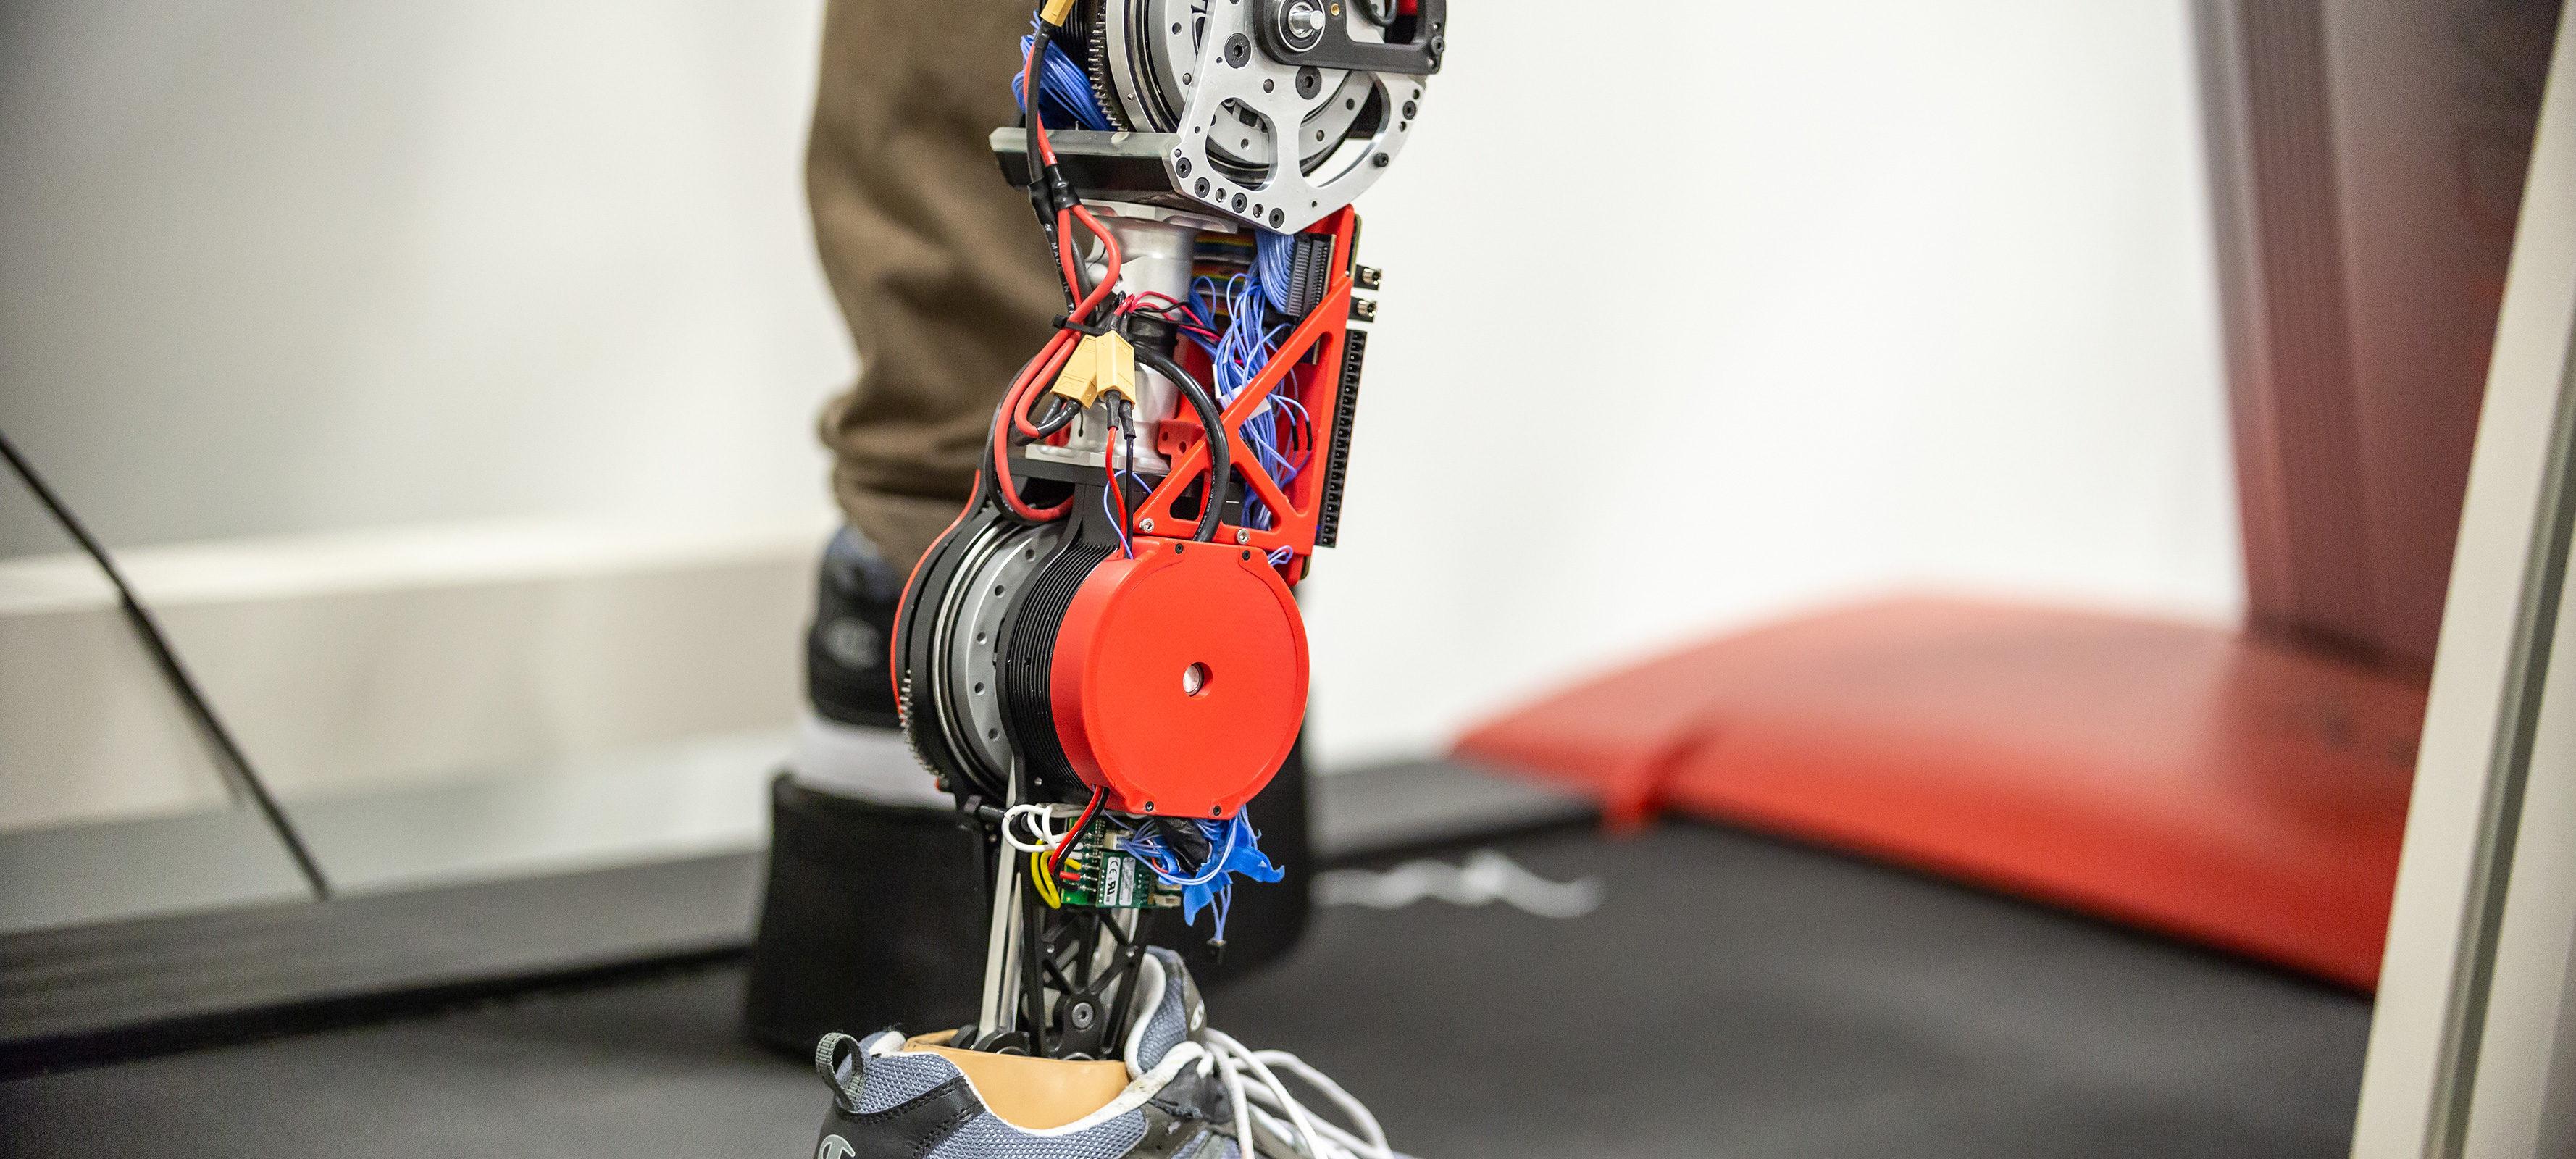 A robotic, prosthetic leg